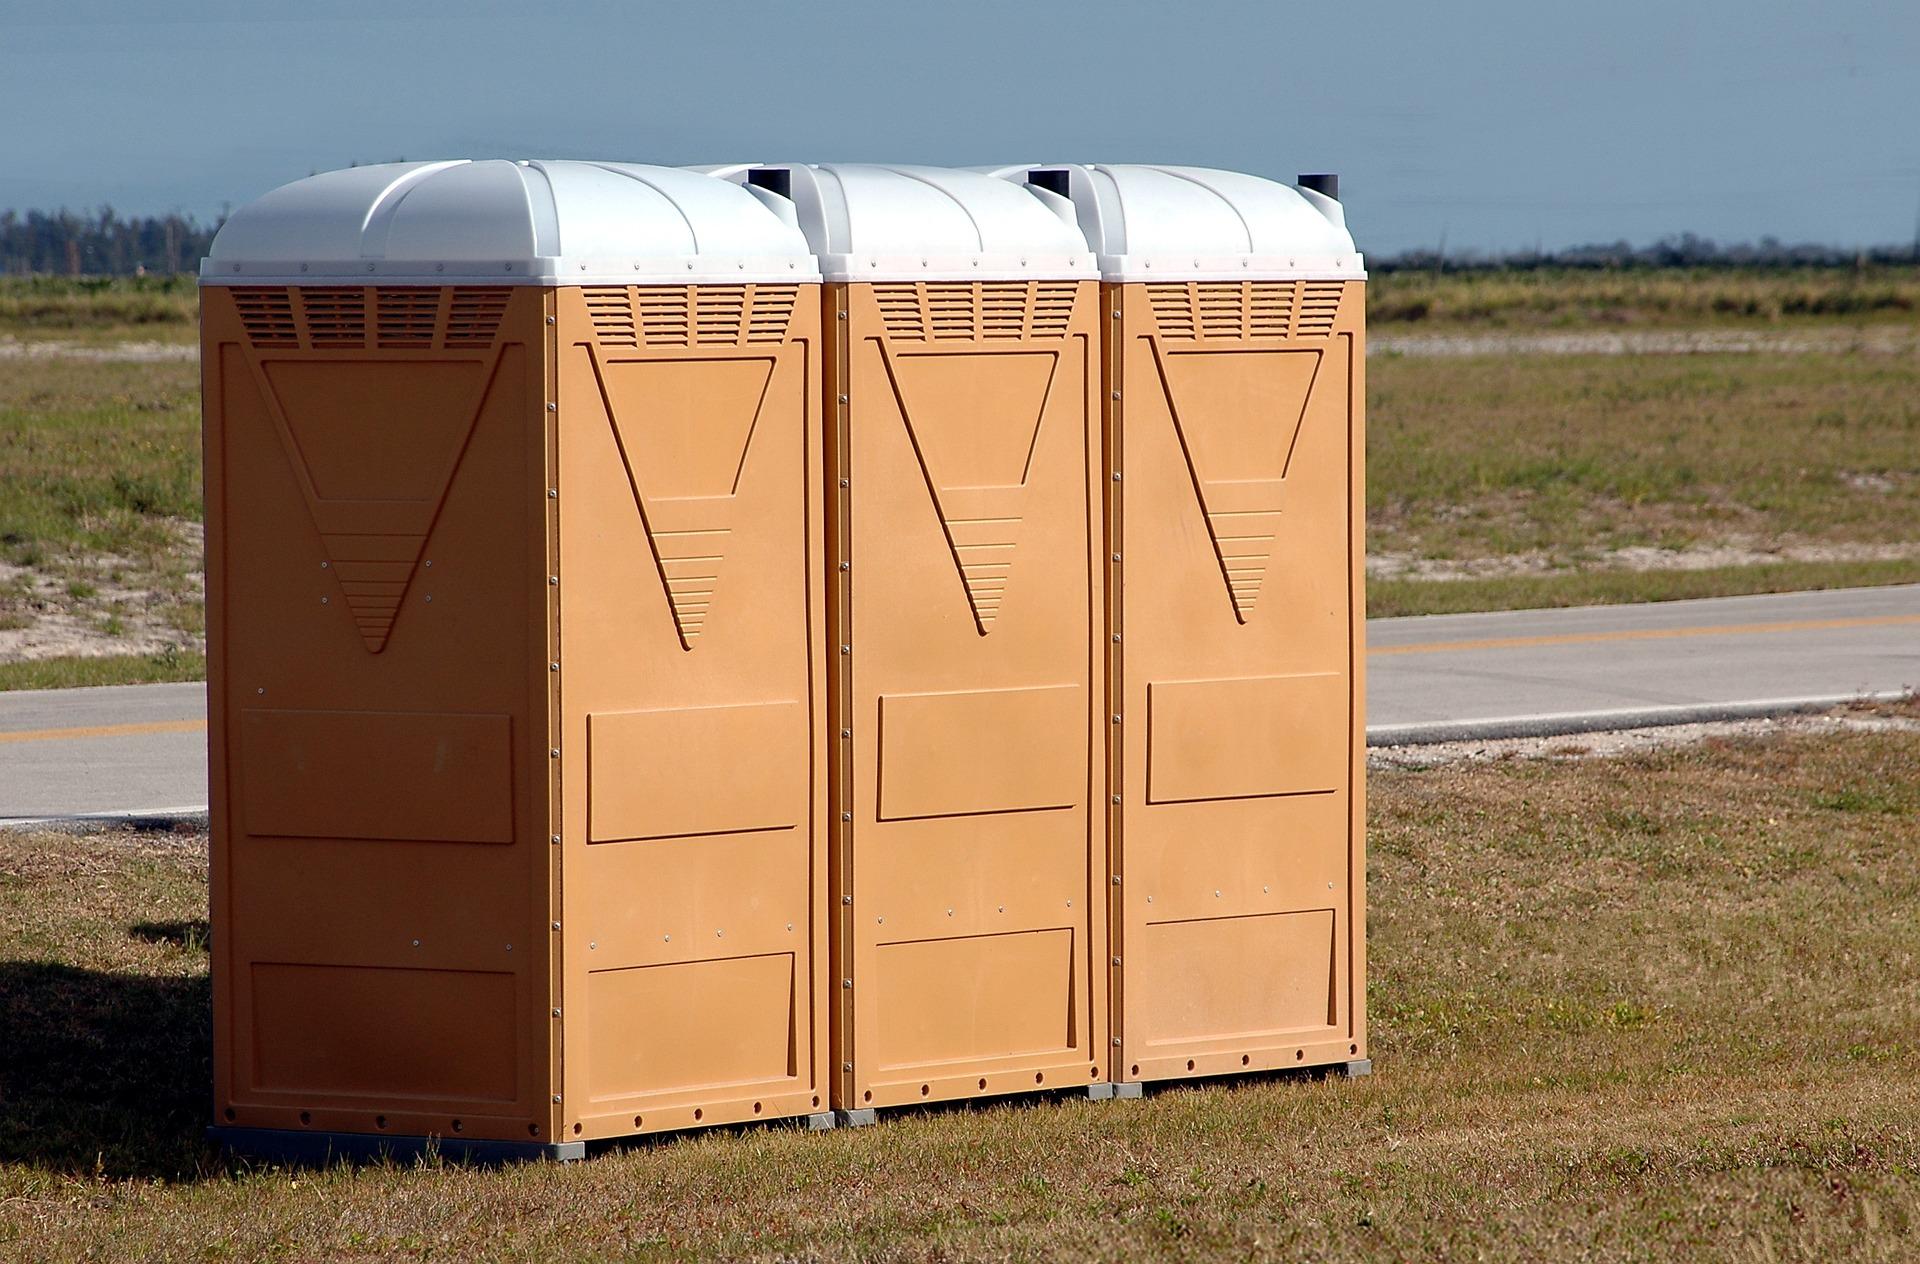 portable-toilets-3042624_1920